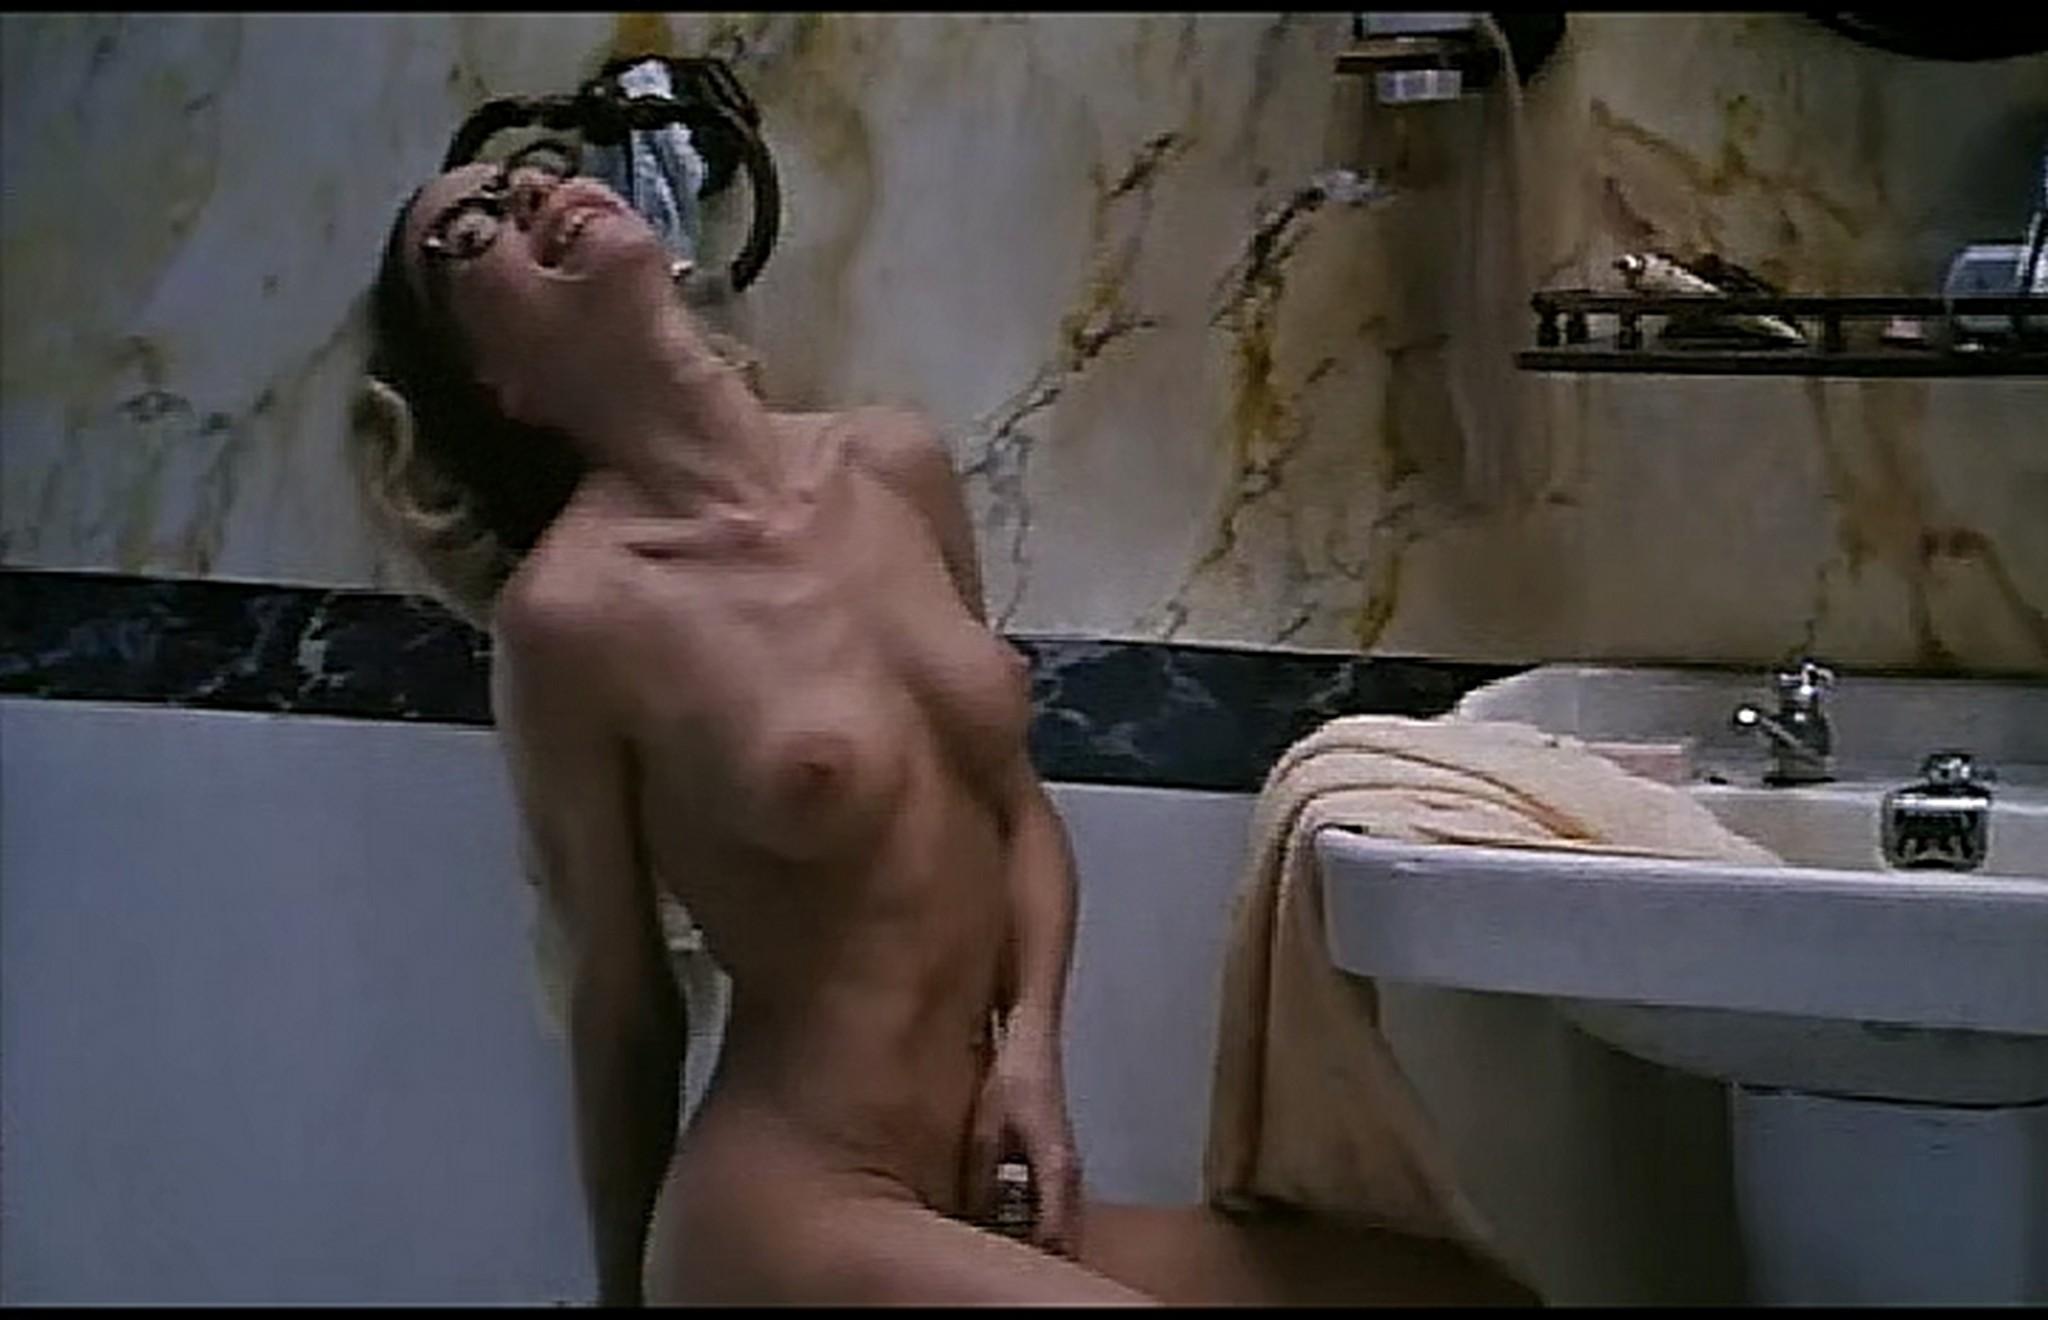 Sophie colquhoun nude